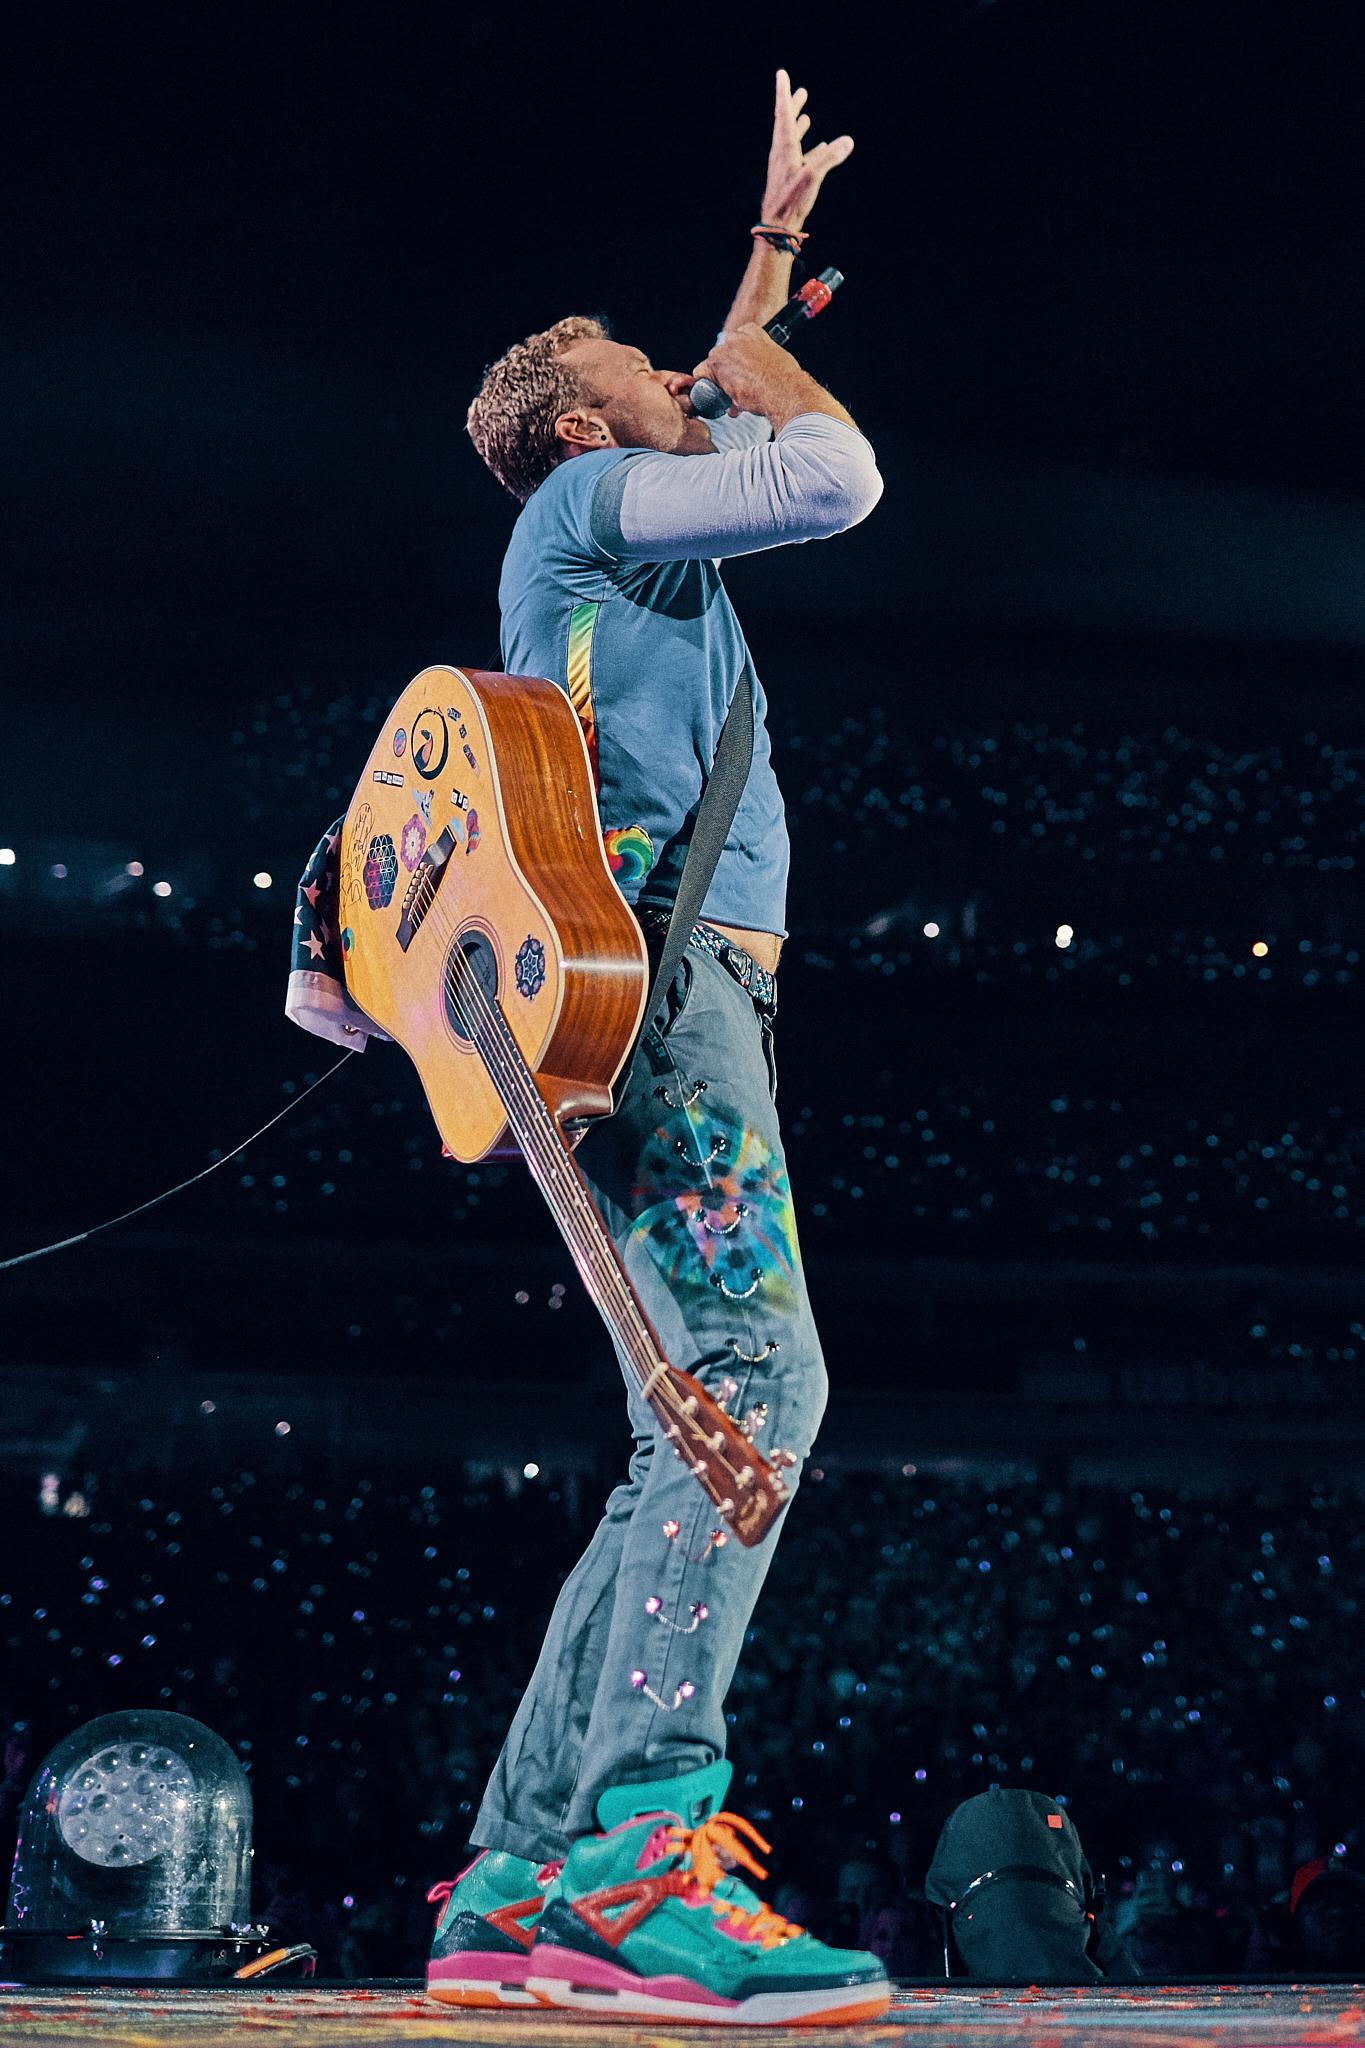 Coldplay_US_Bank_Stadium_Minneapolis_Minnesota_Photography_By_Joe_Lemke_040.JPG